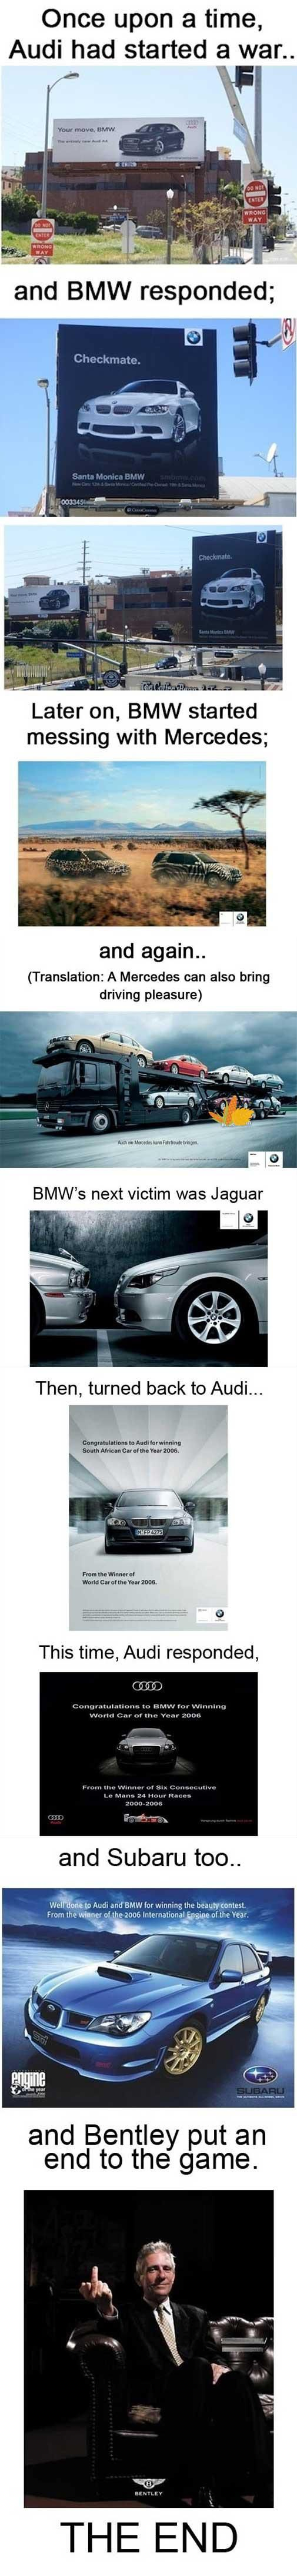 BMW's advertisement war | Marketing | Car jokes, Funny